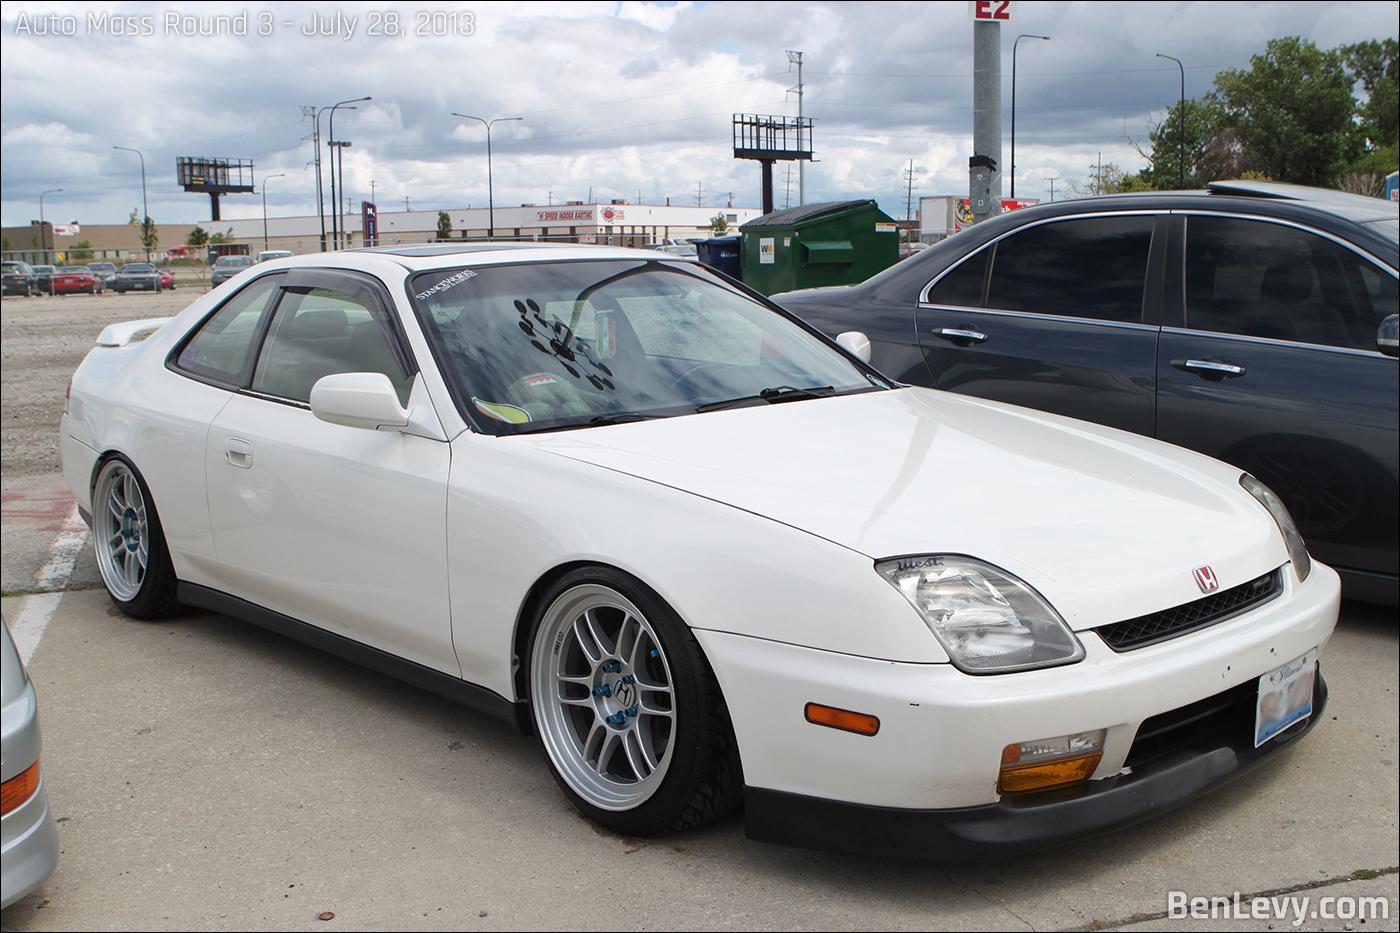 White Honda Prelude Benlevy Com